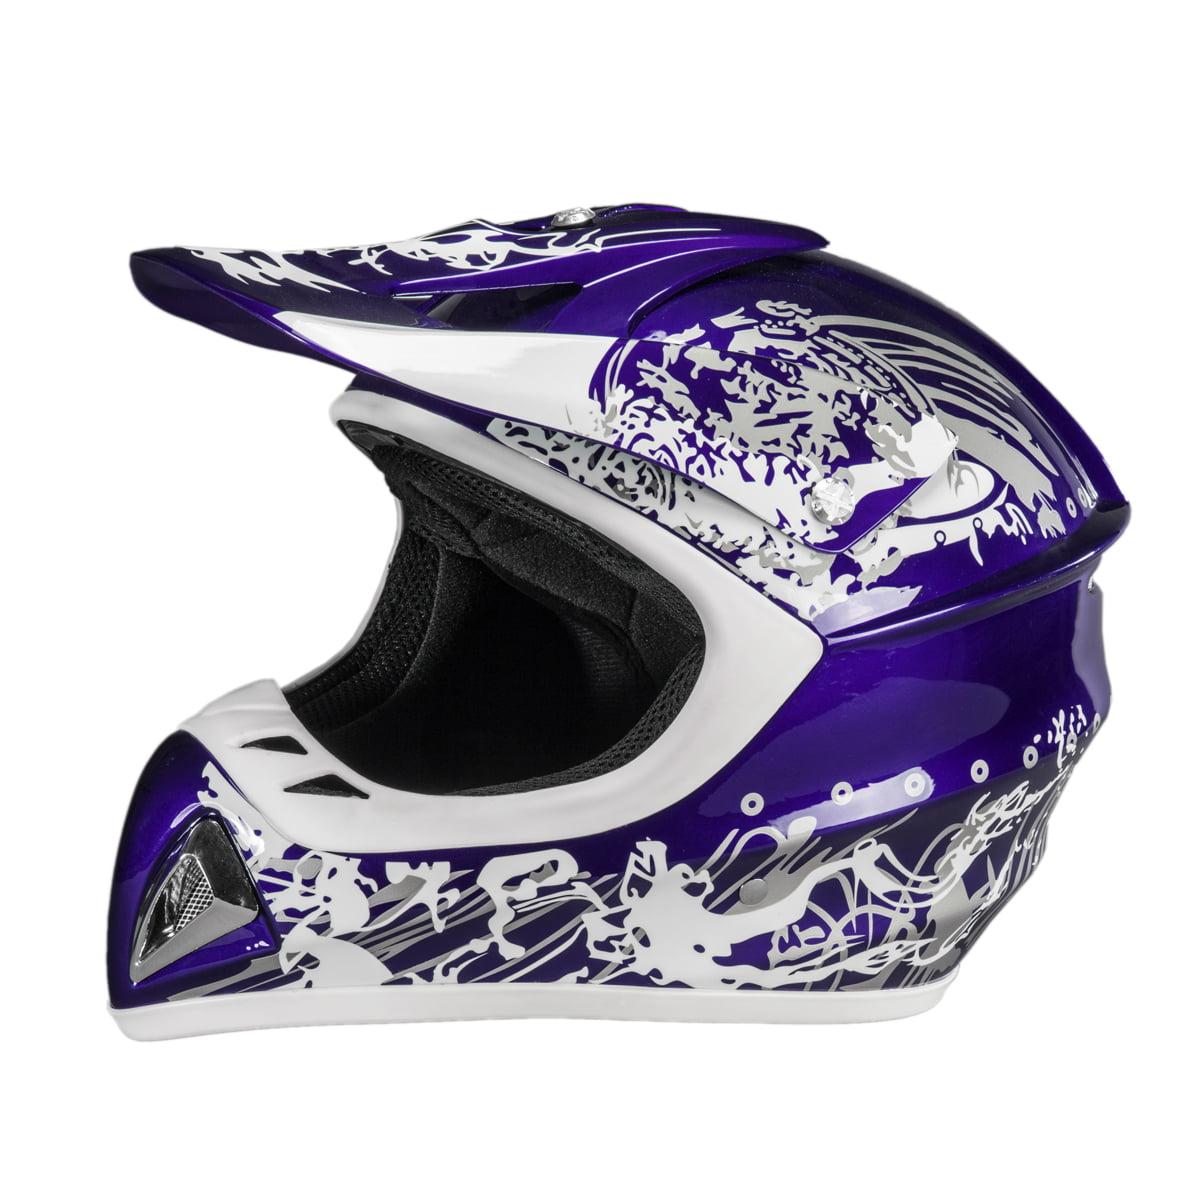 Adult Raider Adrenaline Helmet MX ATV Off Road BMX Dirt Bike Motorcycle DOT